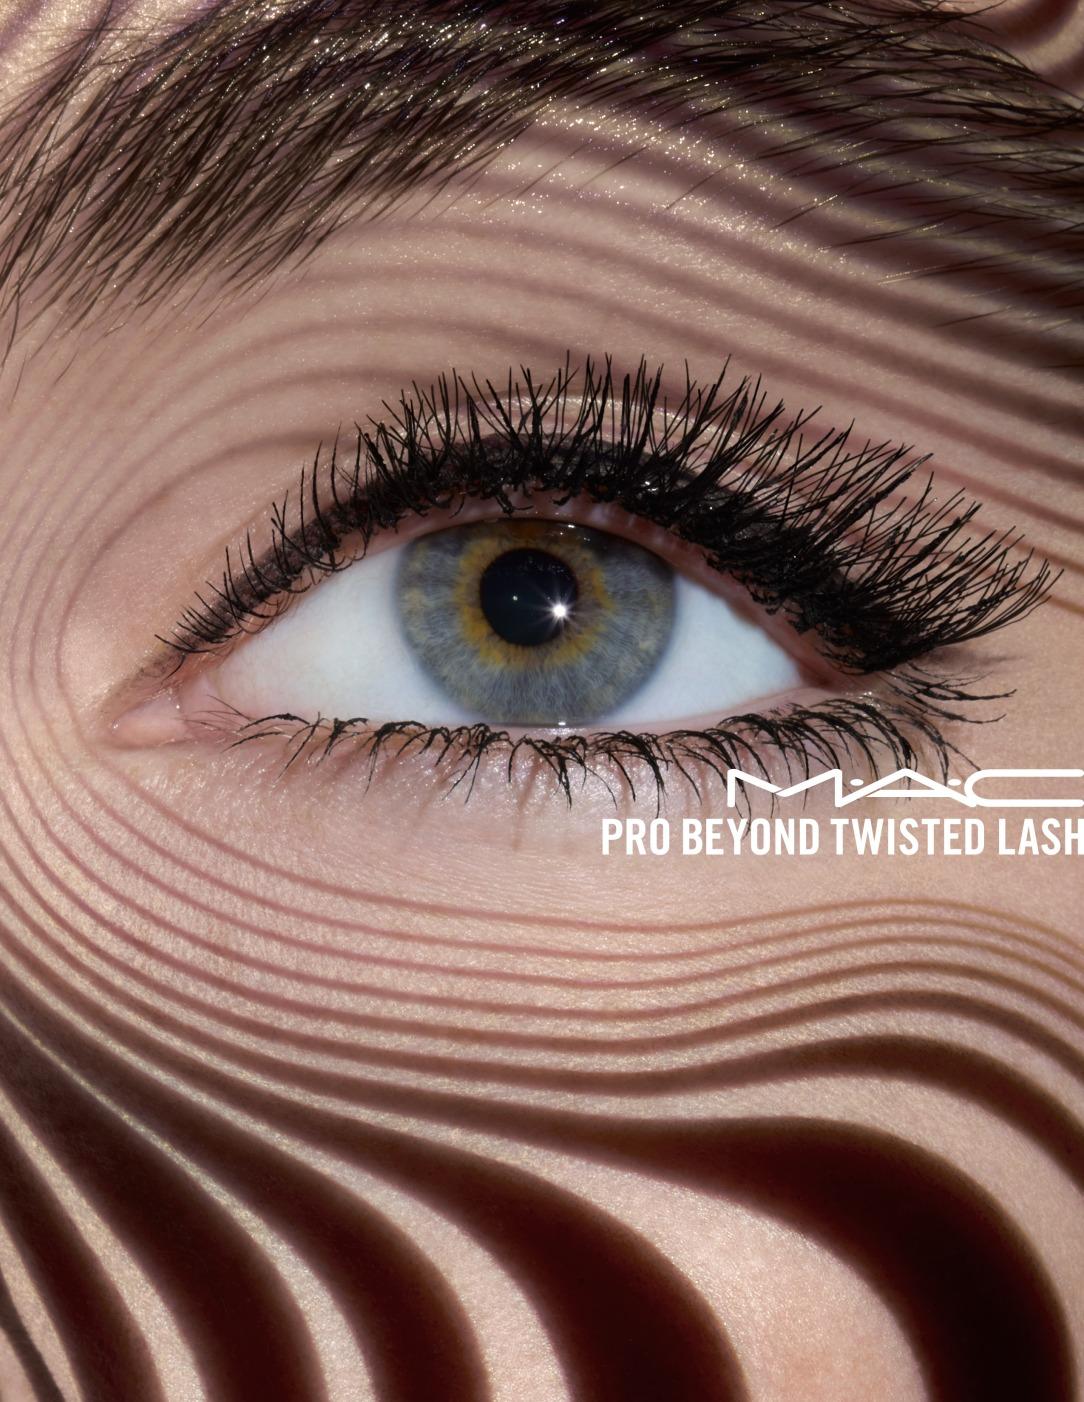 Pro Beyond Twisted Lash_BEAUTY_RGB_300